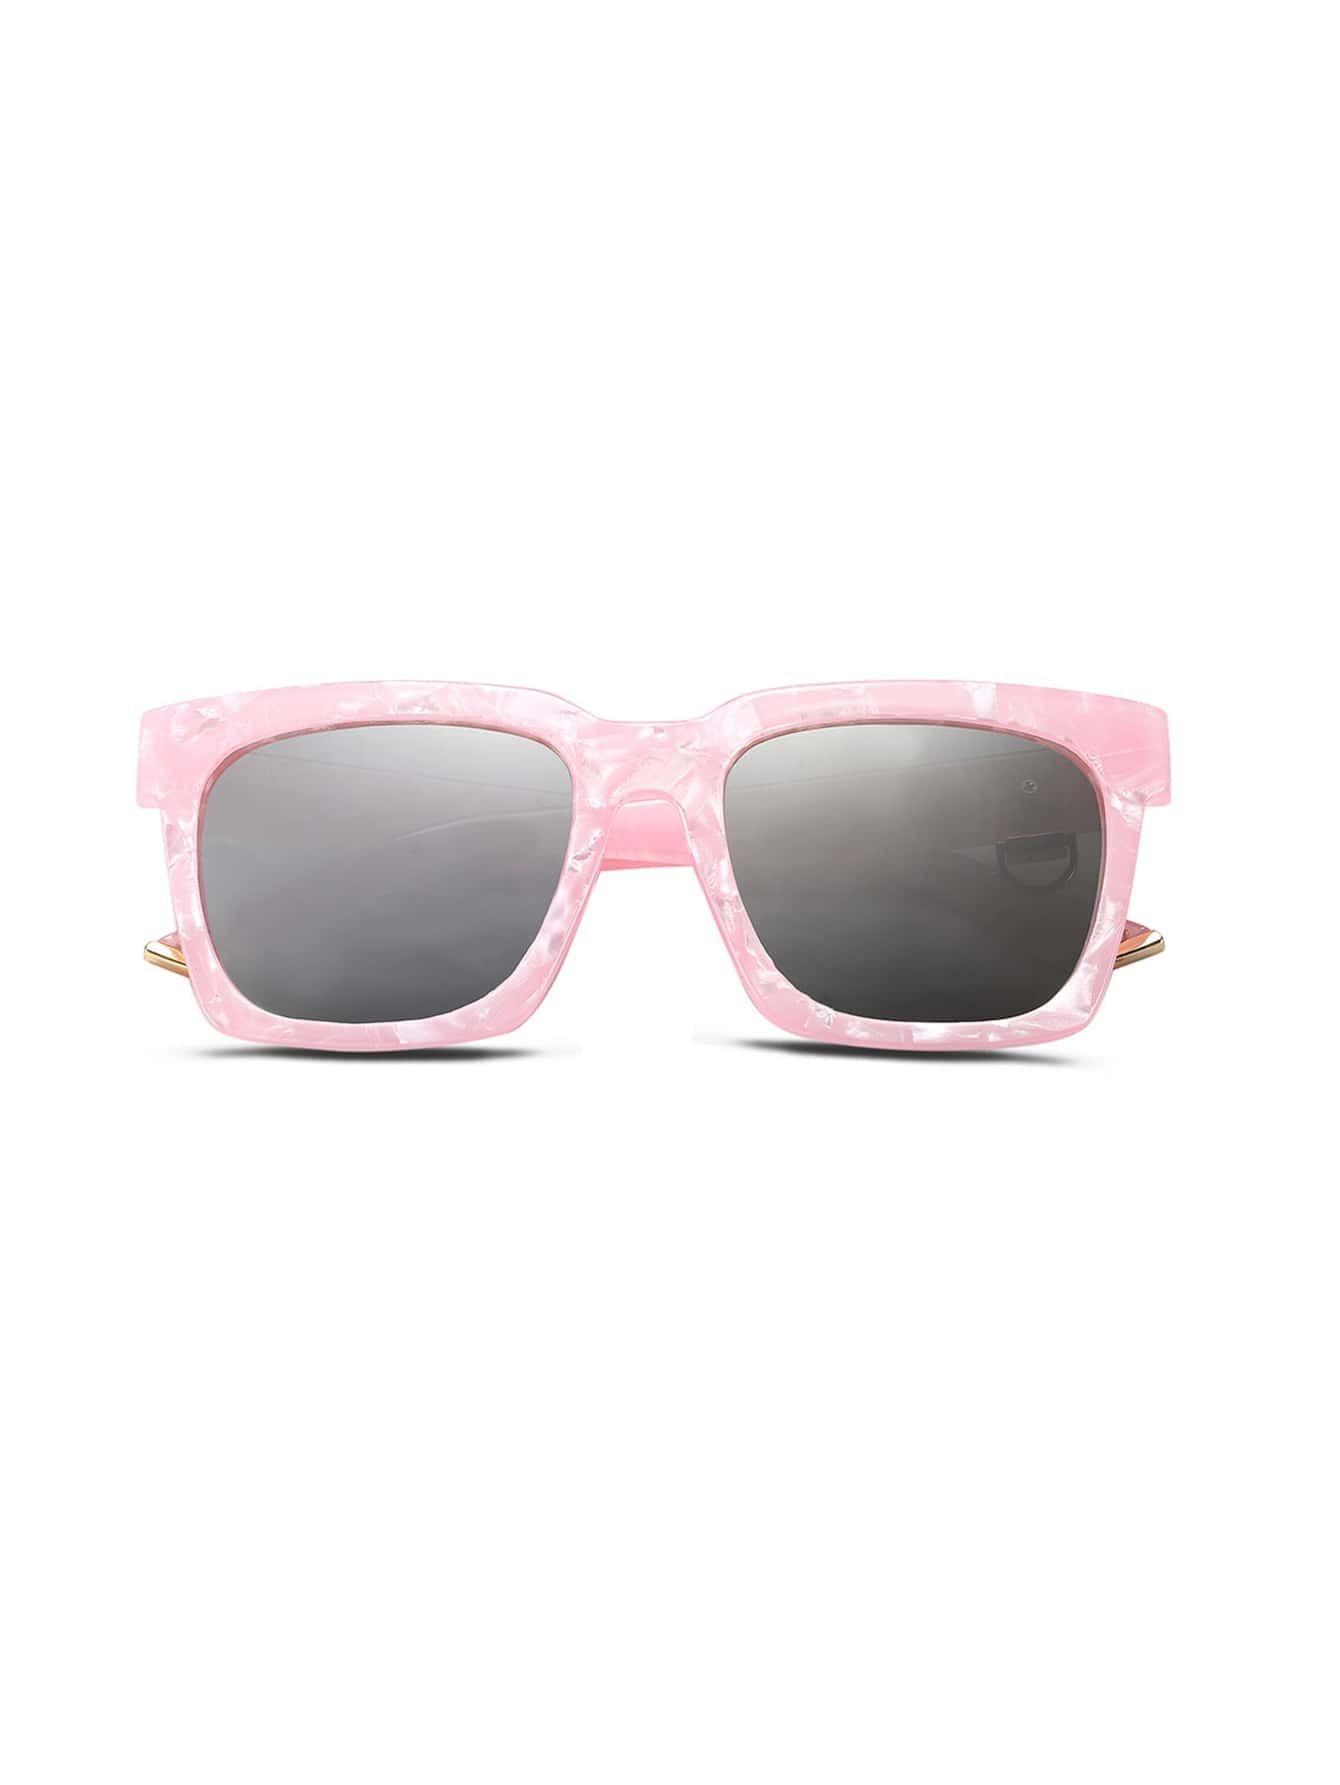 Pink Frame Gold Trim Sunglasses -SheIn(Sheinside)